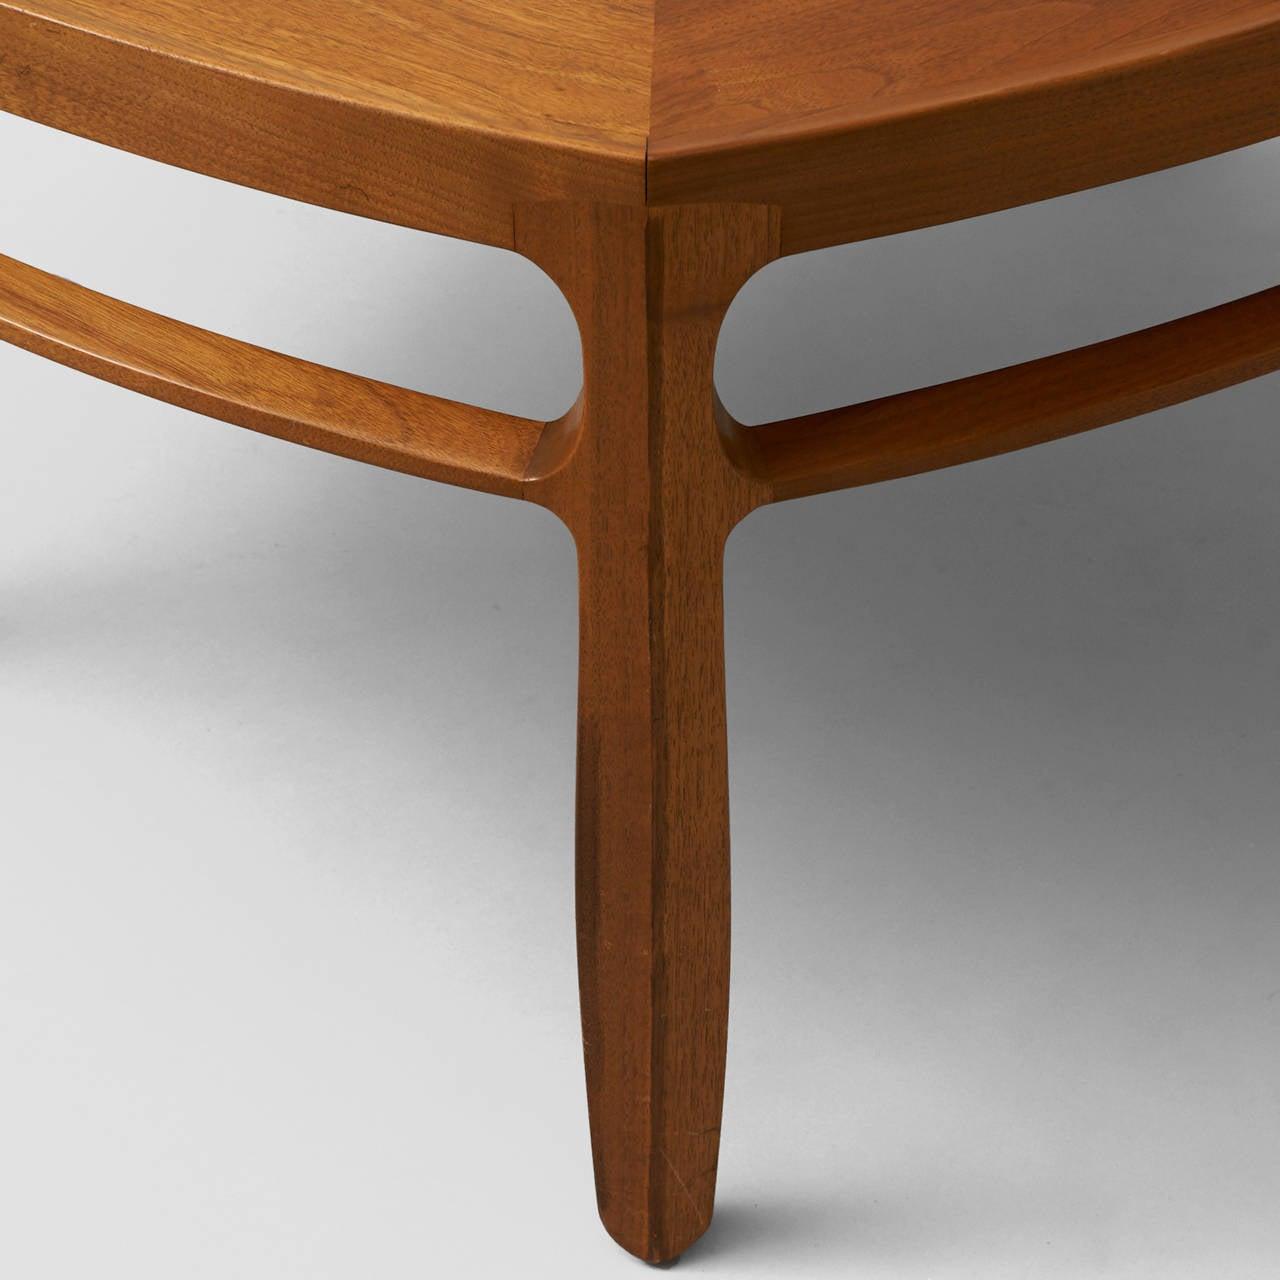 Mid-20th Century Edward Wormley, Pentagonal Coffee Table For Sale